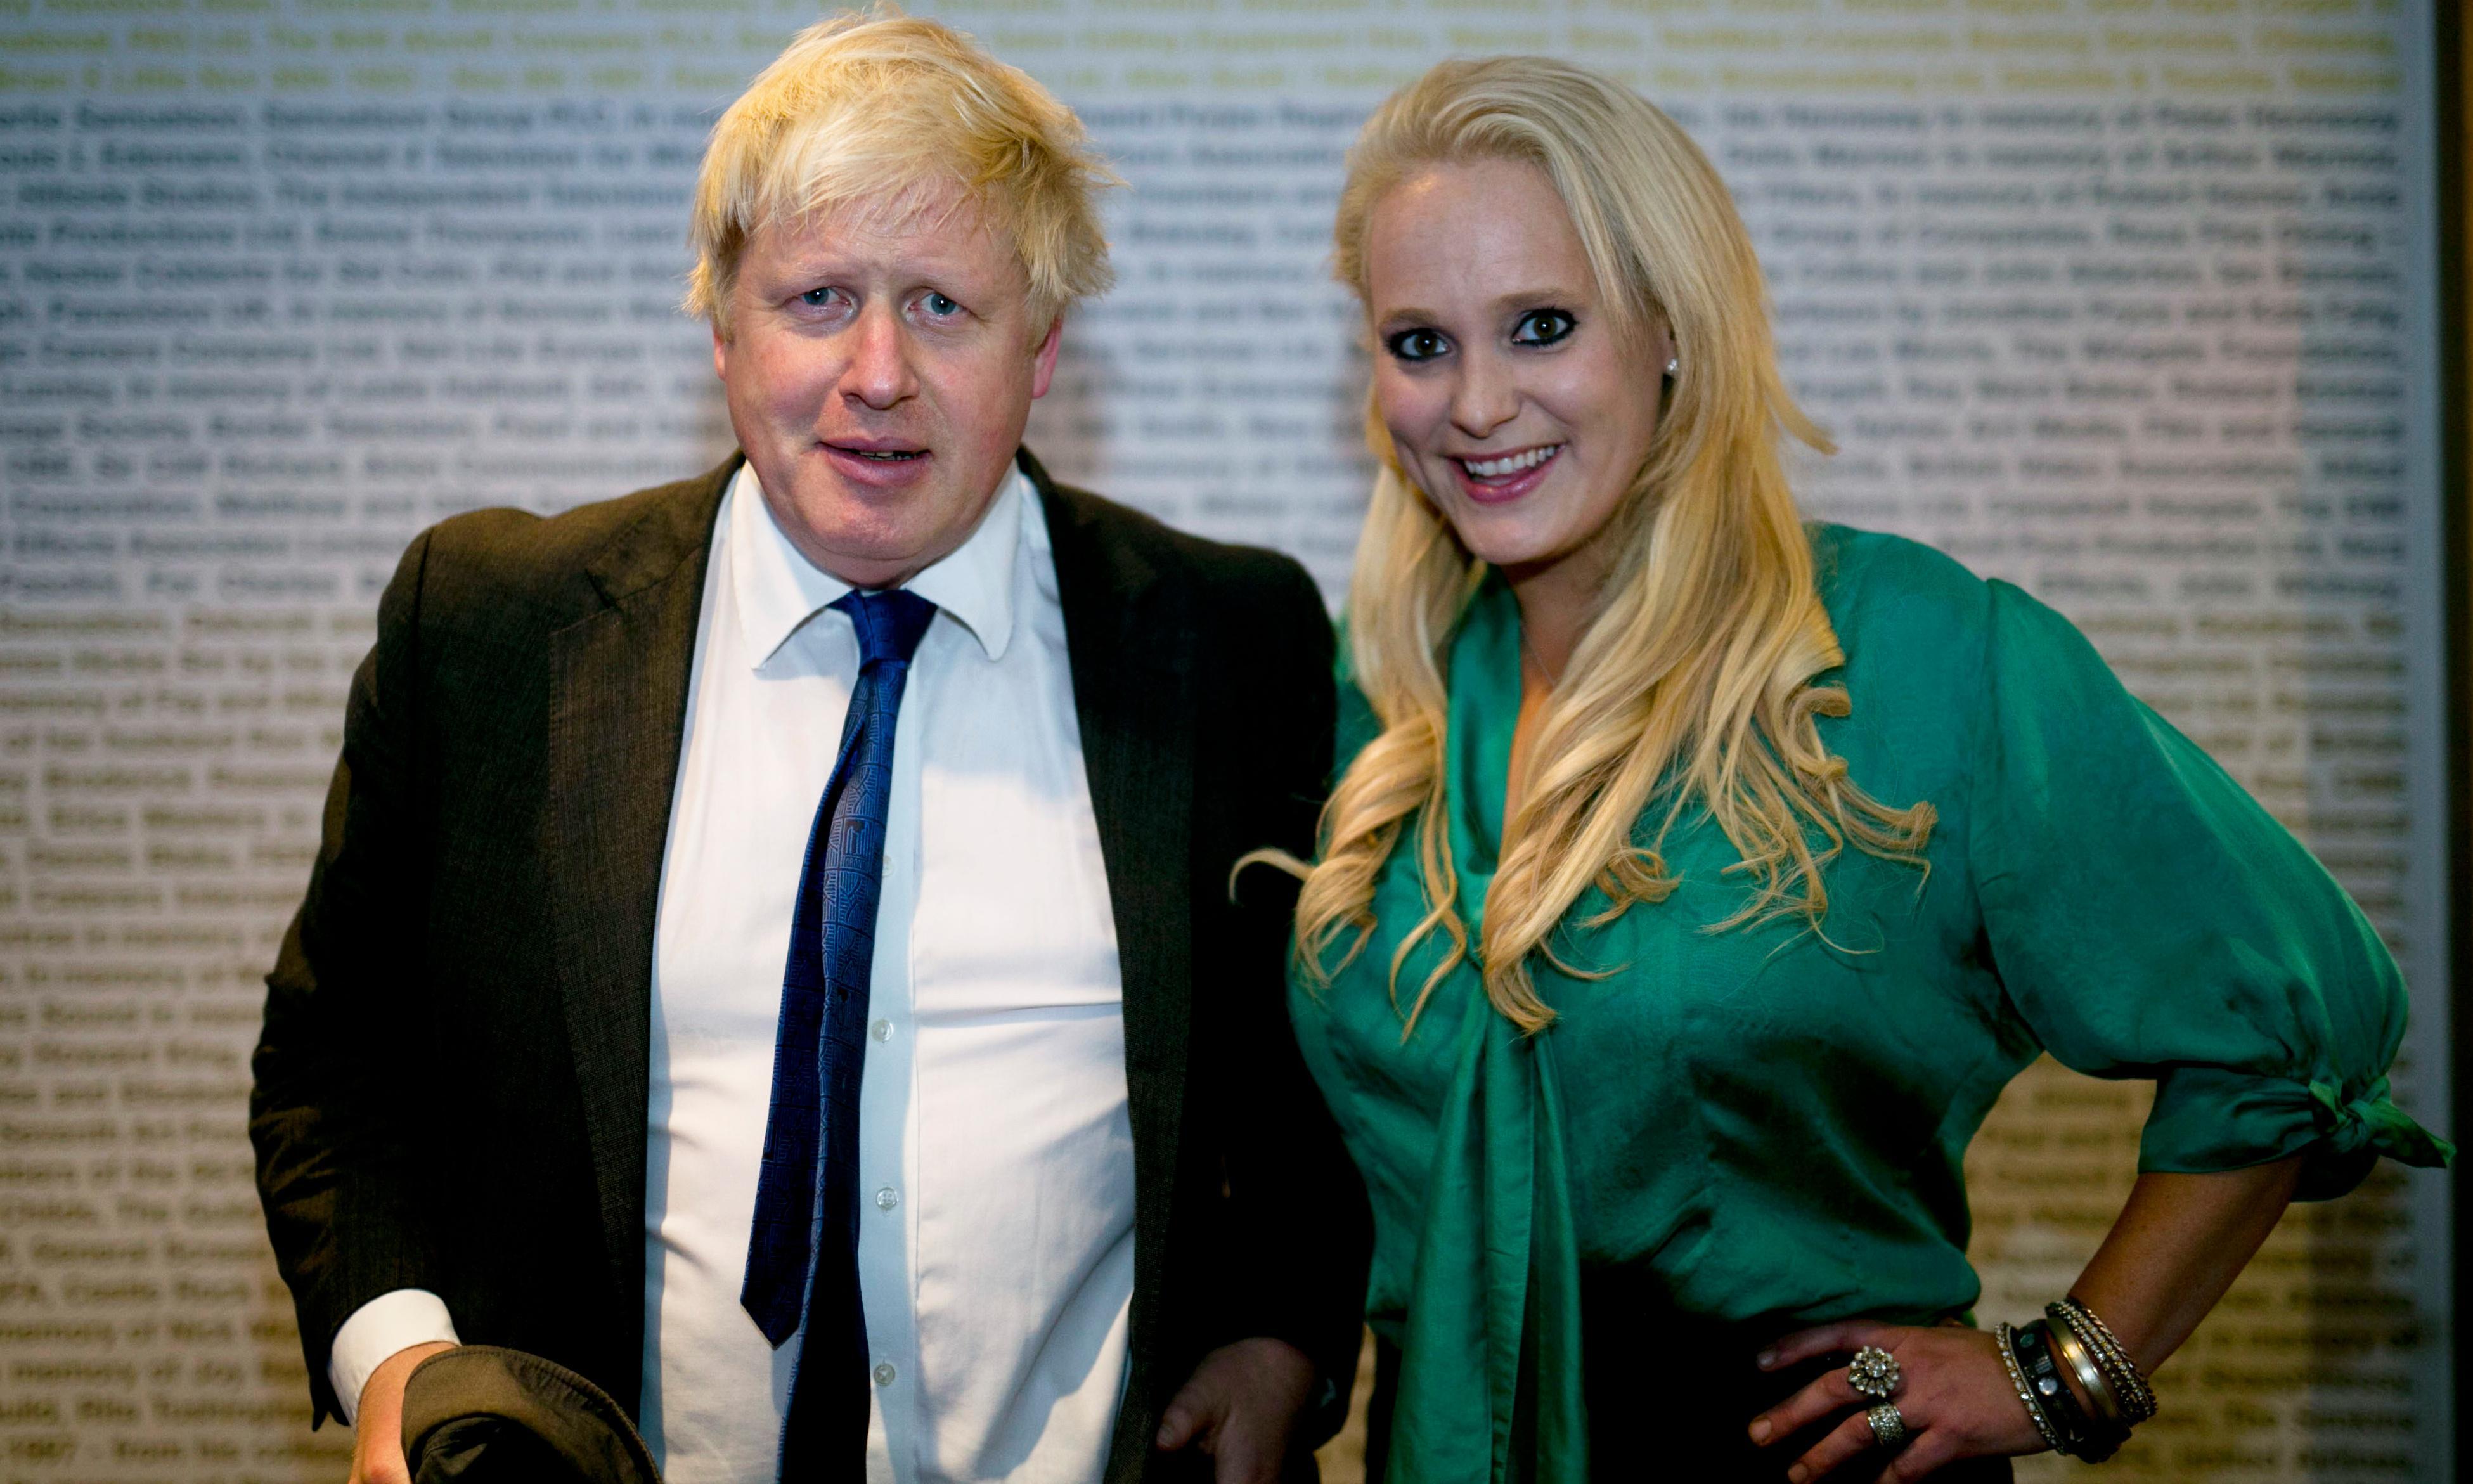 Boris Johnson urged to justify 'awarding public funds to close friend'